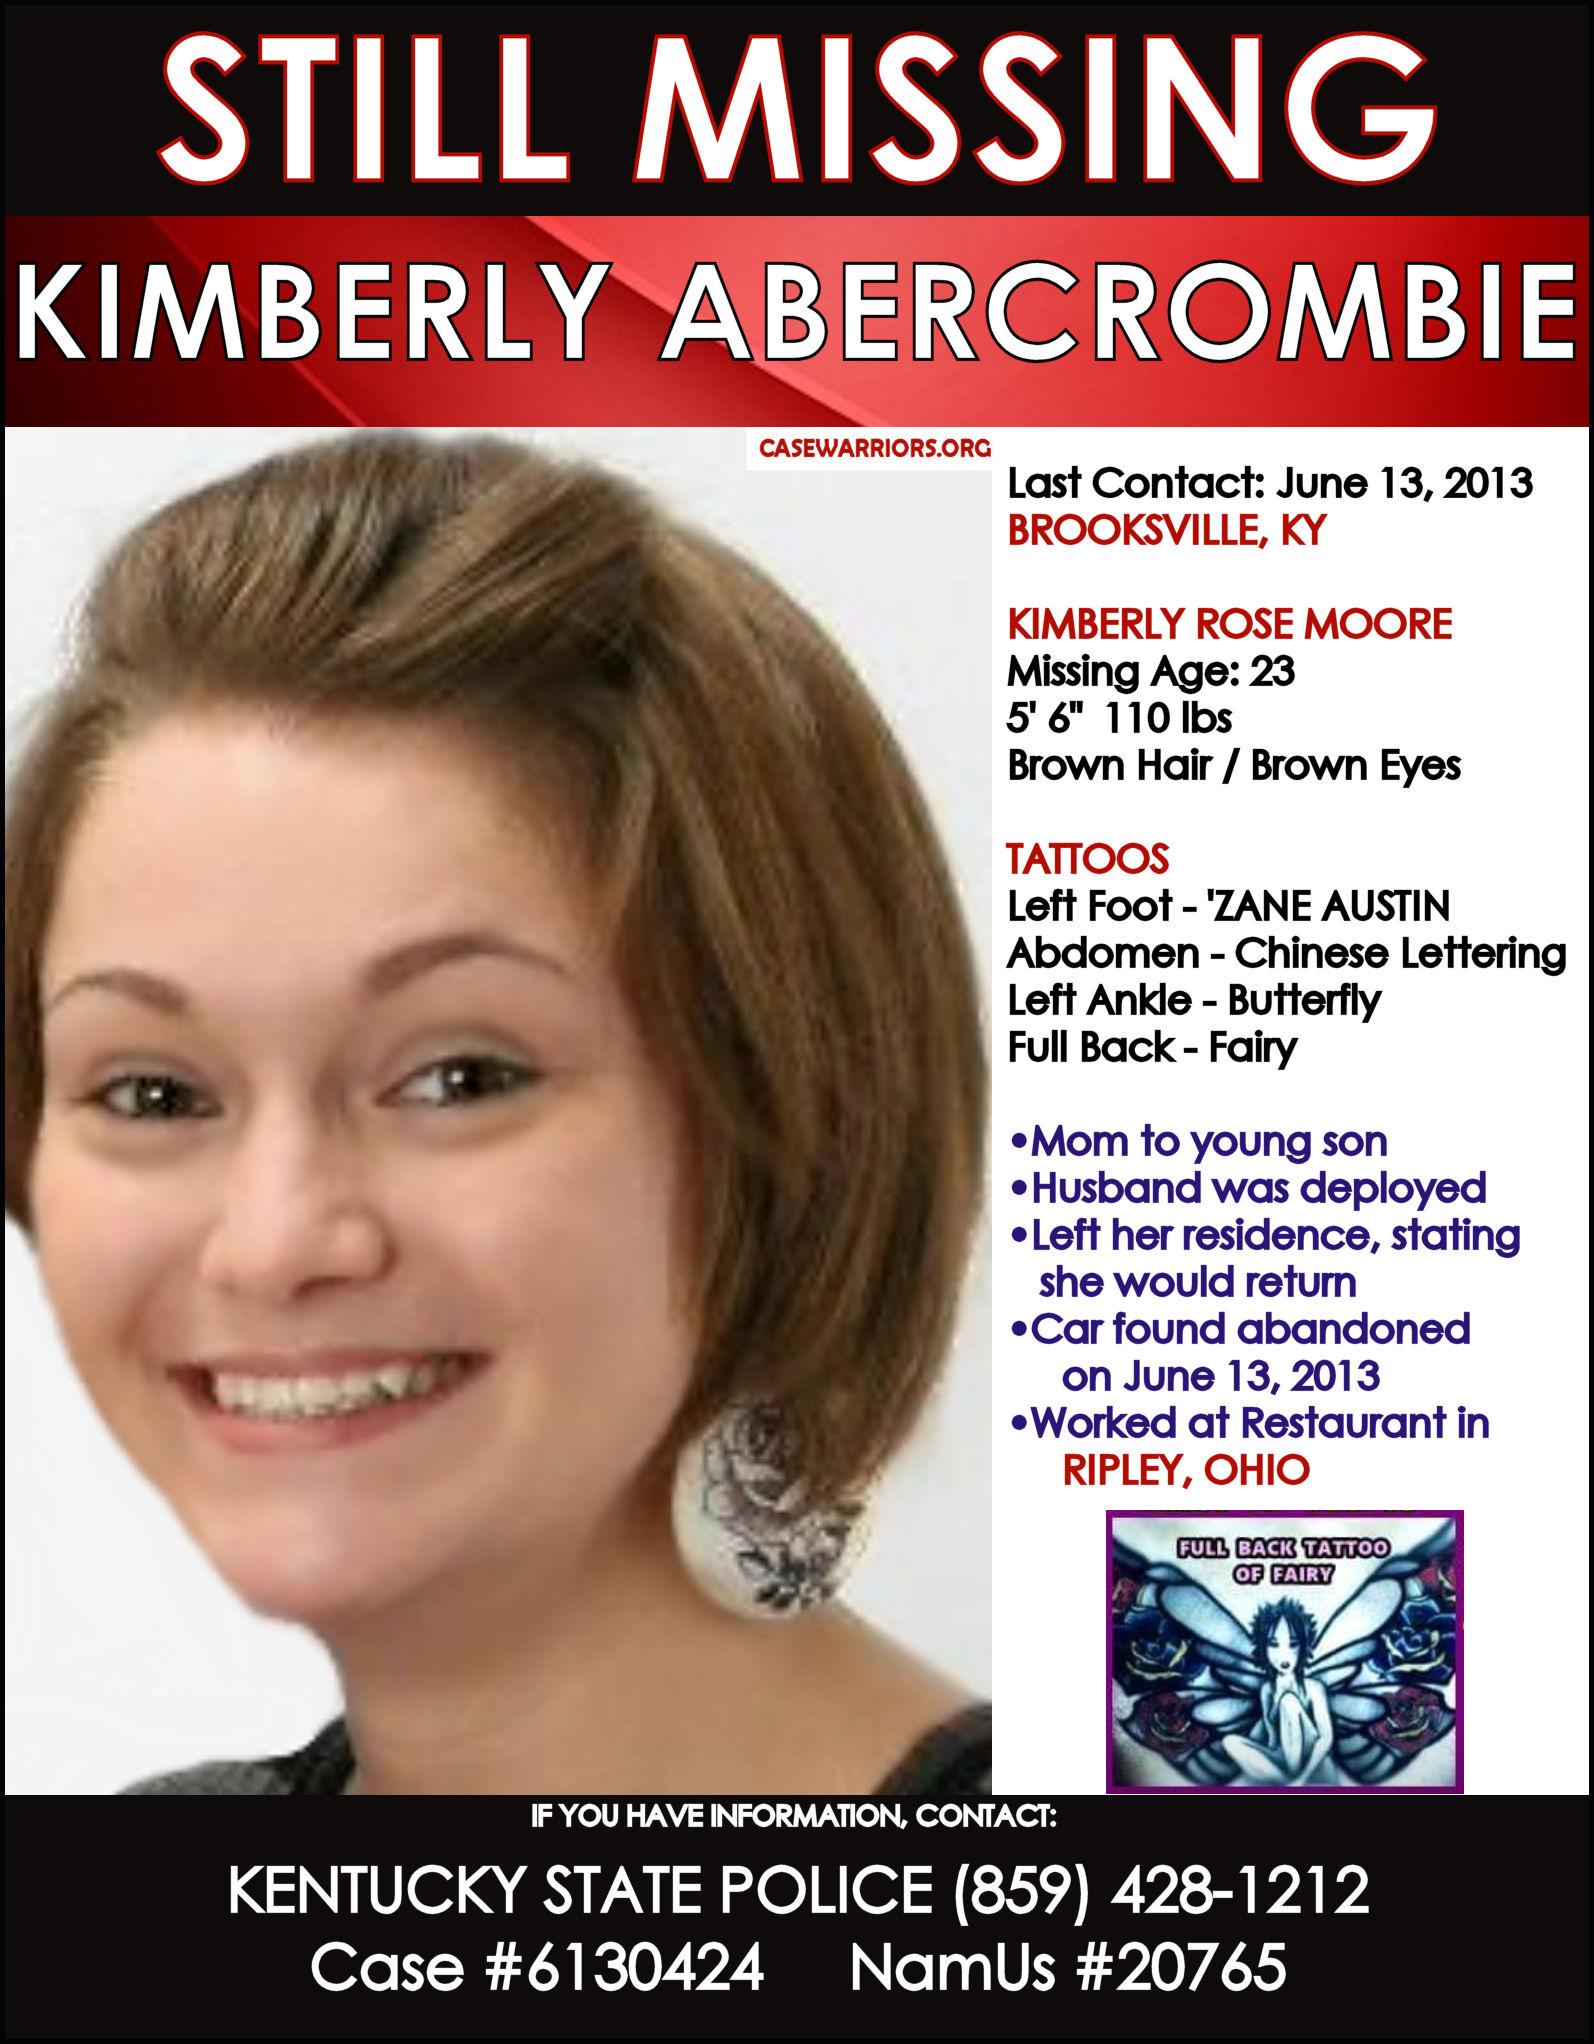 KIMBERLY ABERCROMBIE